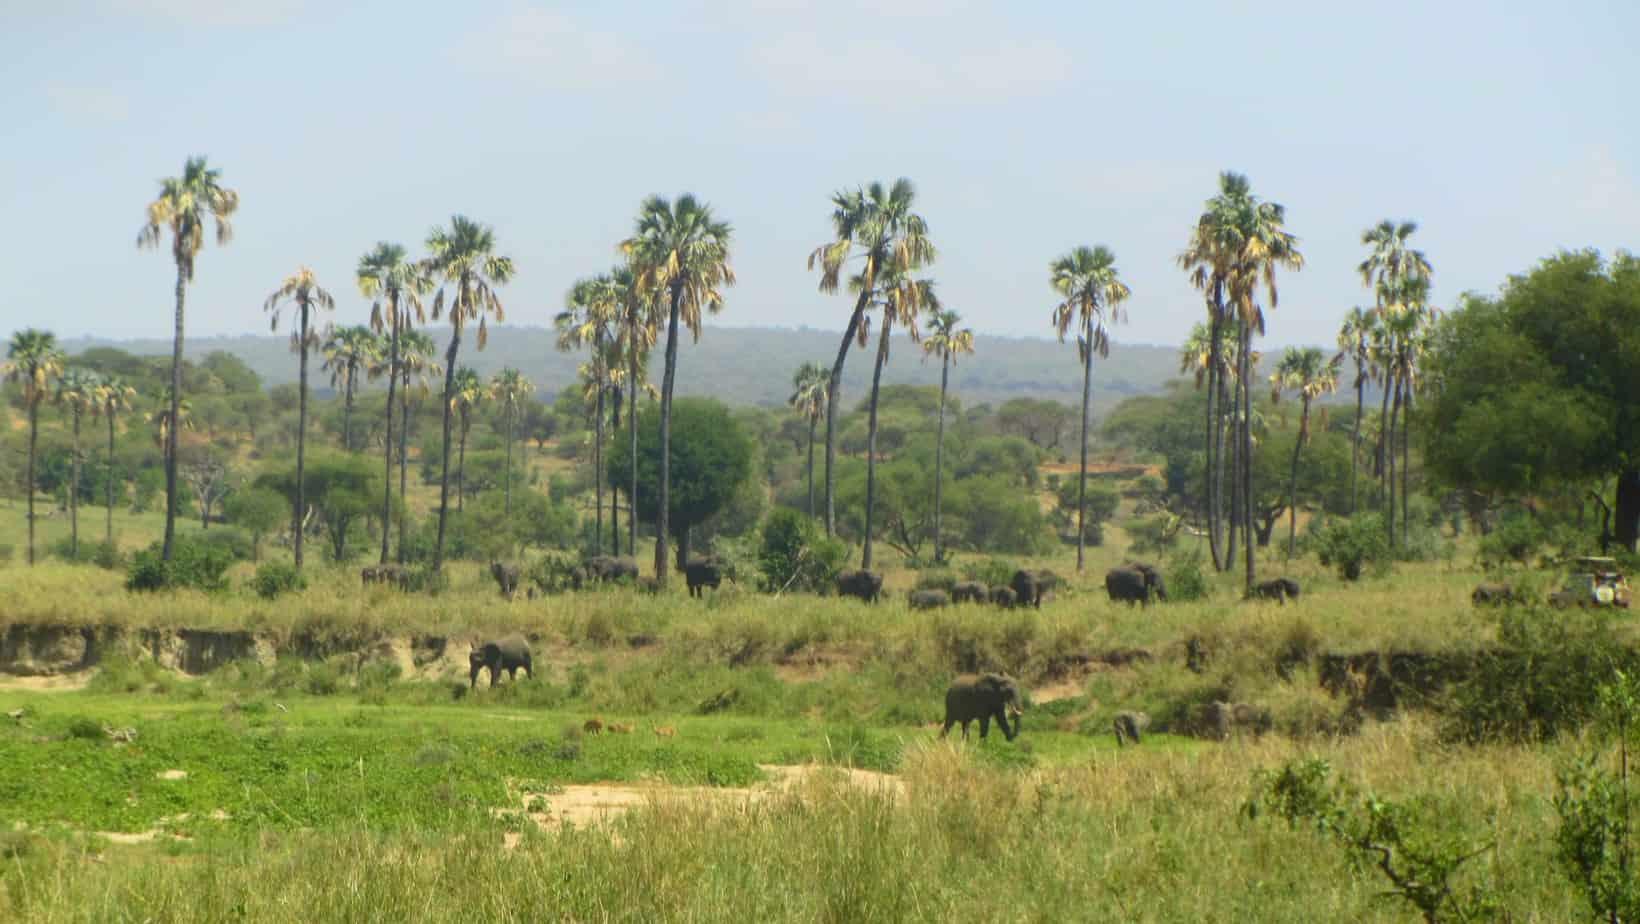 Tarangire Elephants